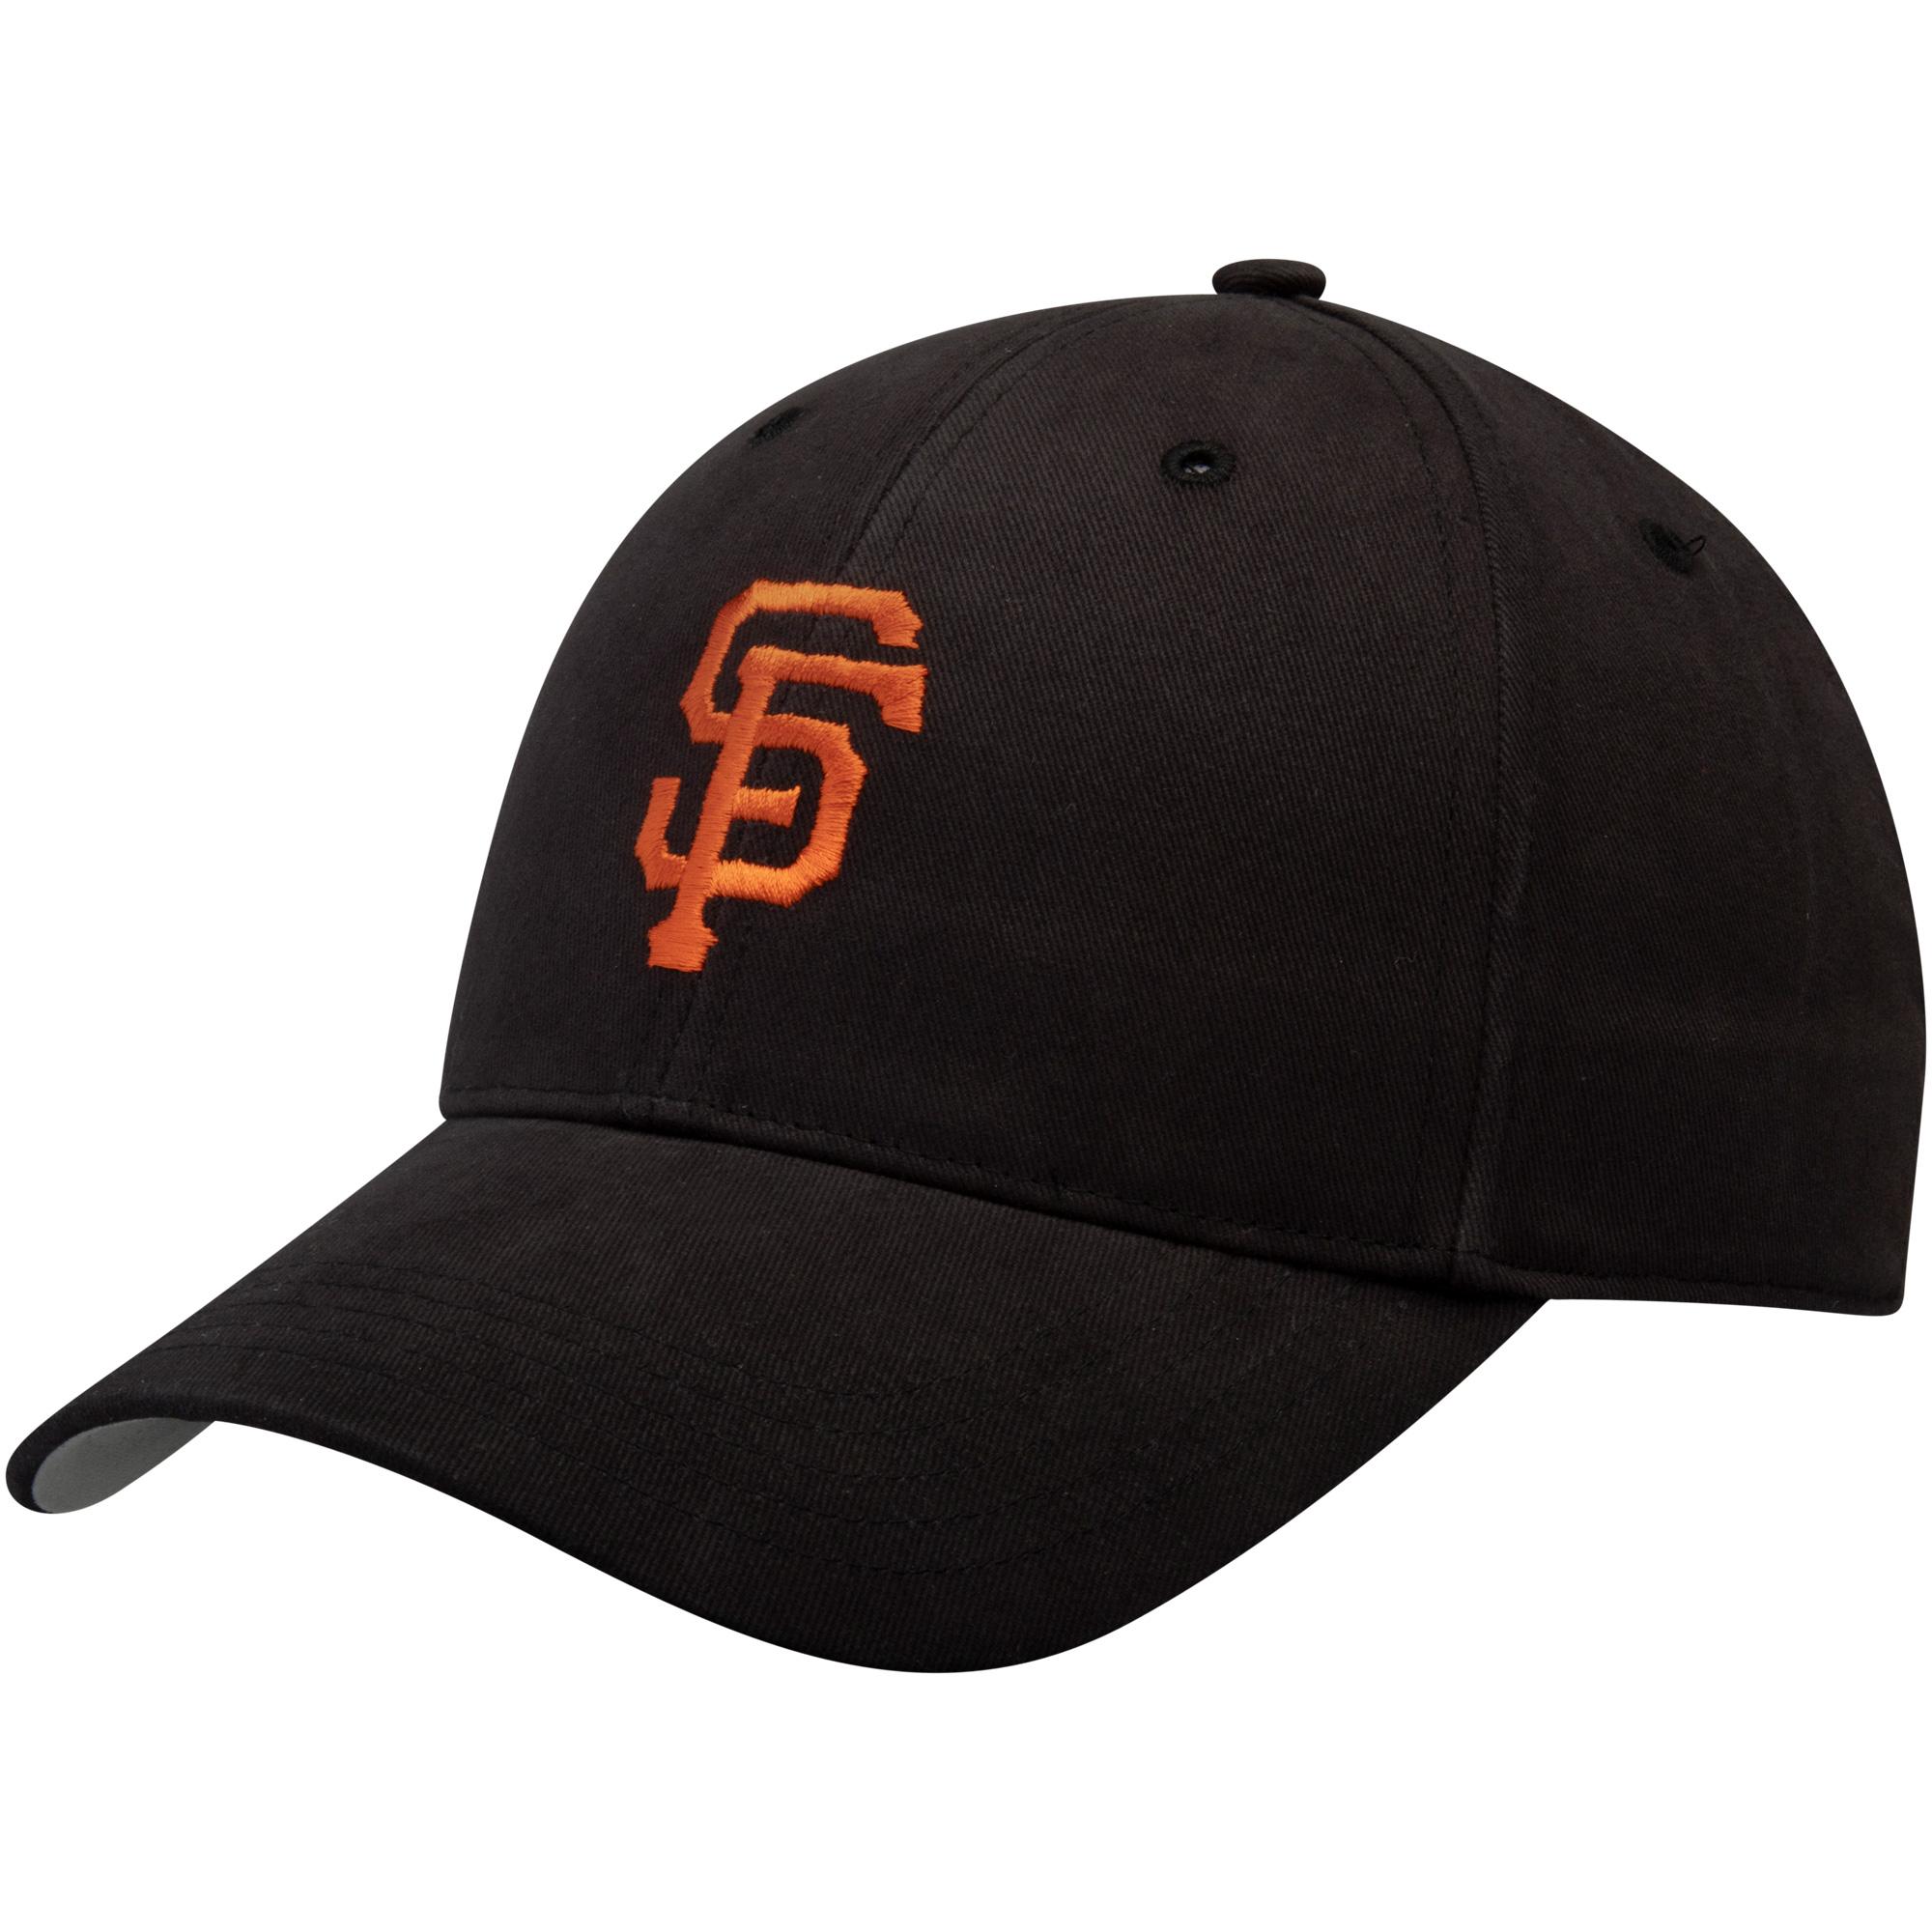 San Francisco Giants Fan Favorite Youth Basic Adjustable Hat - Black - OSFA